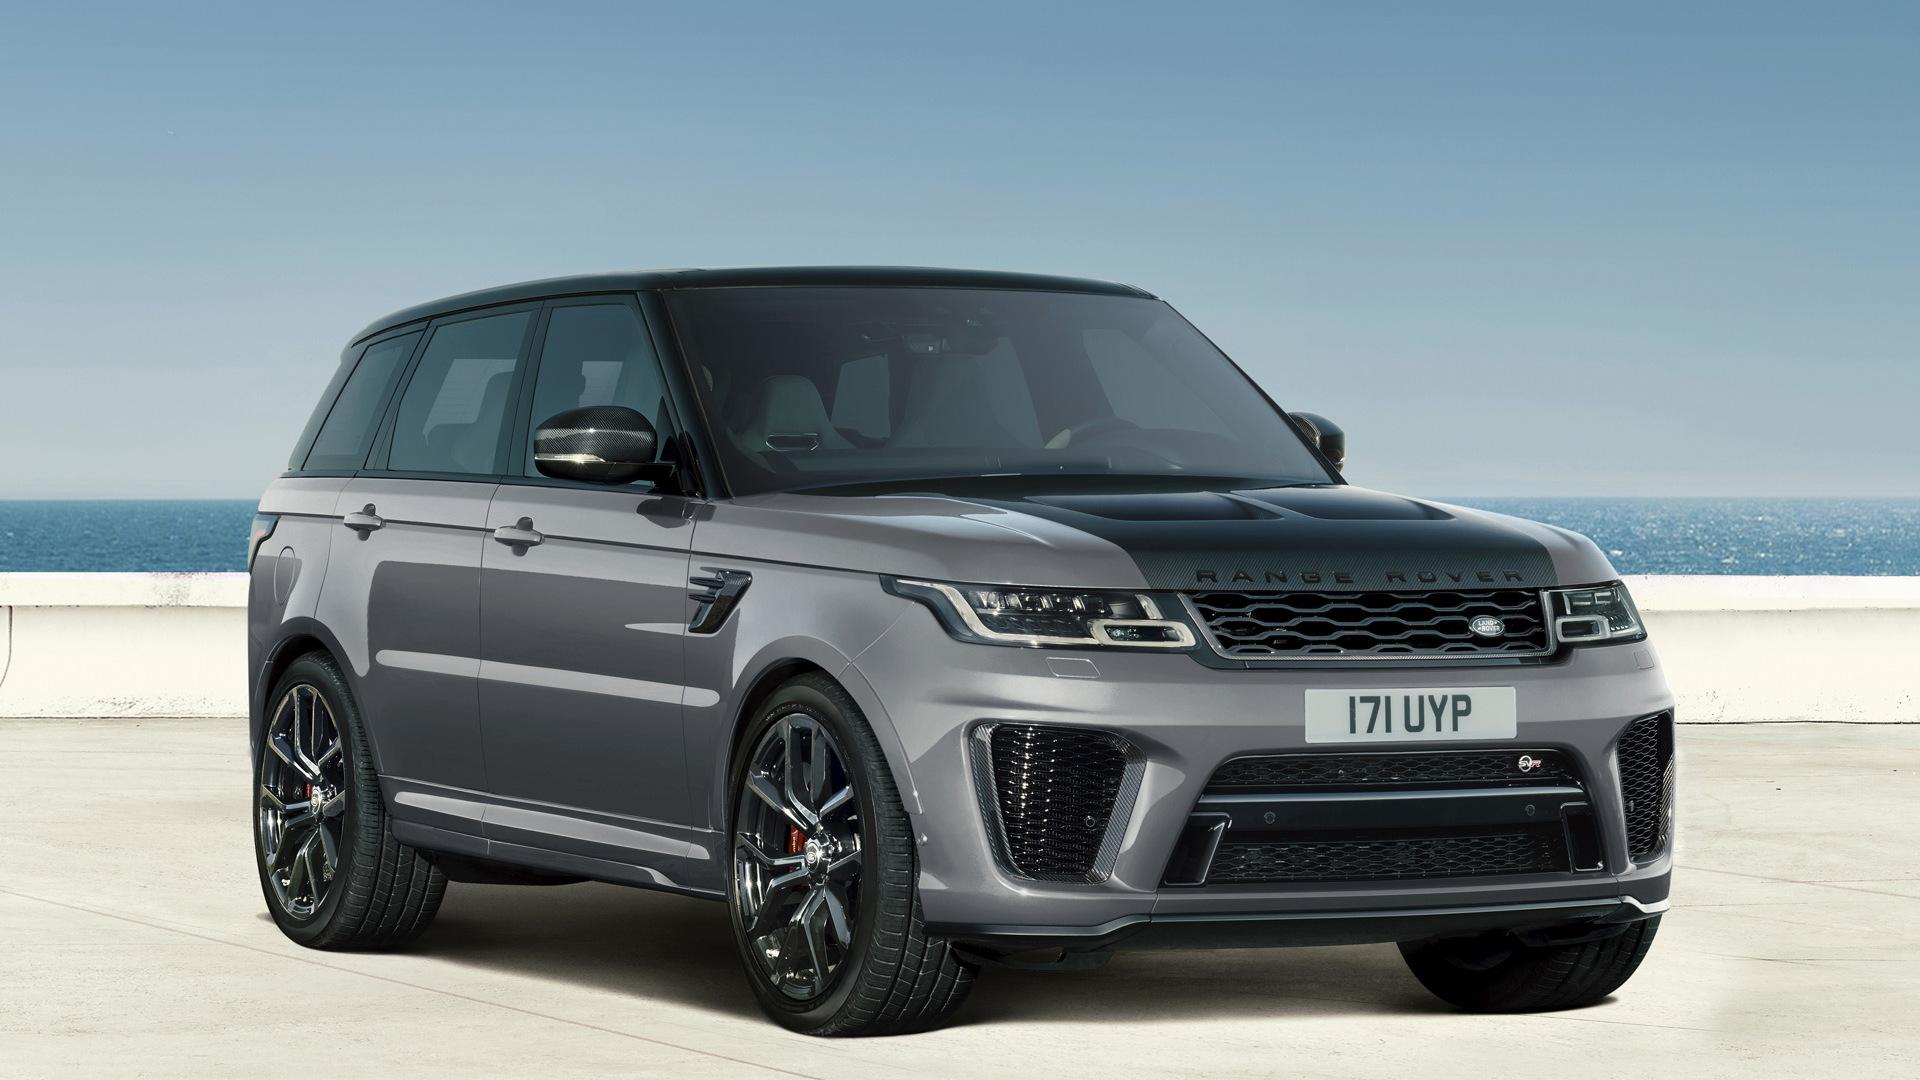 2021 Land Rover Range Rover Sport SVR Carbon Edition